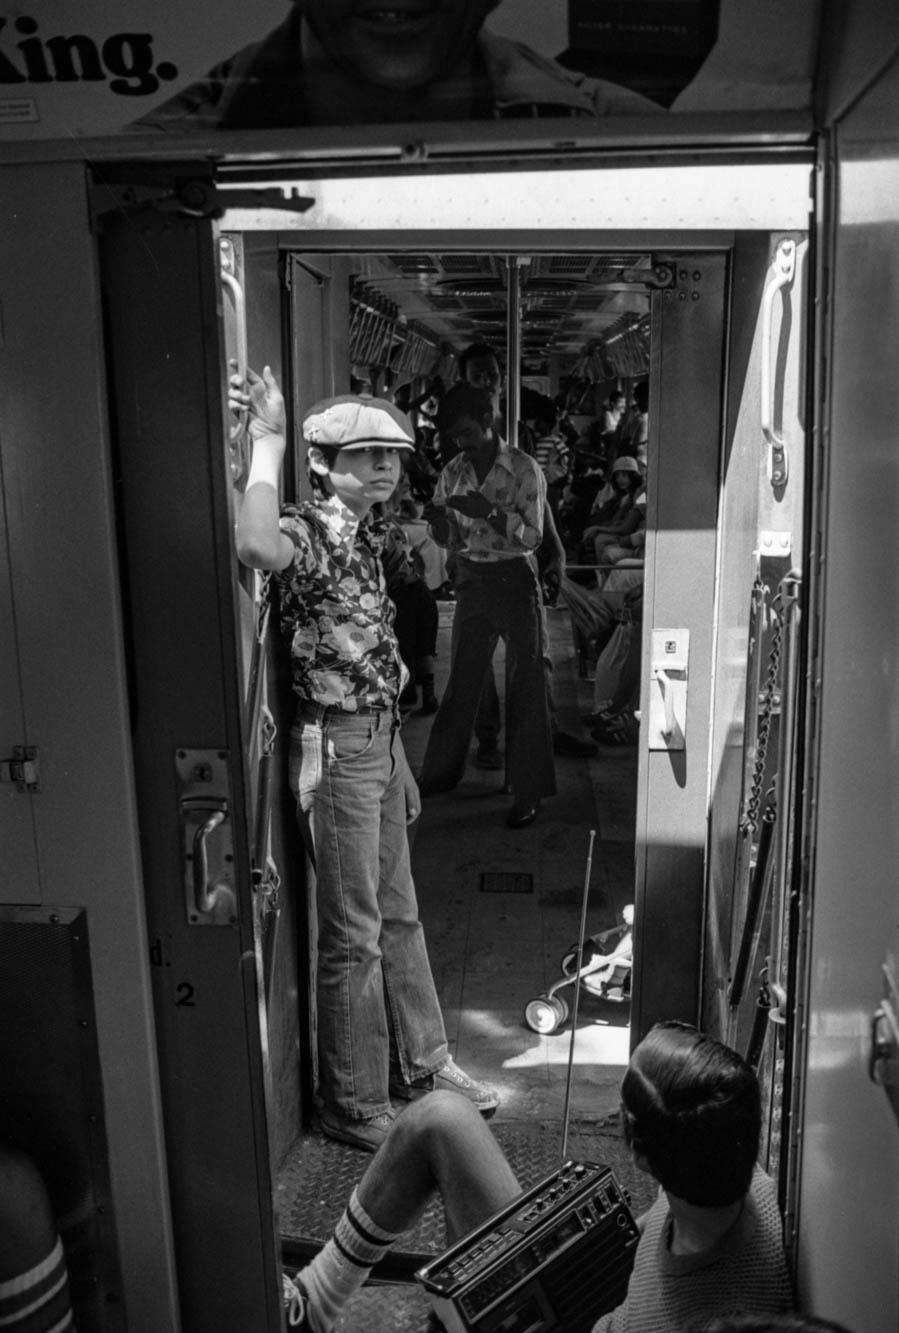 Copy of Boy Between Subway Cars (New York, NY), 1977